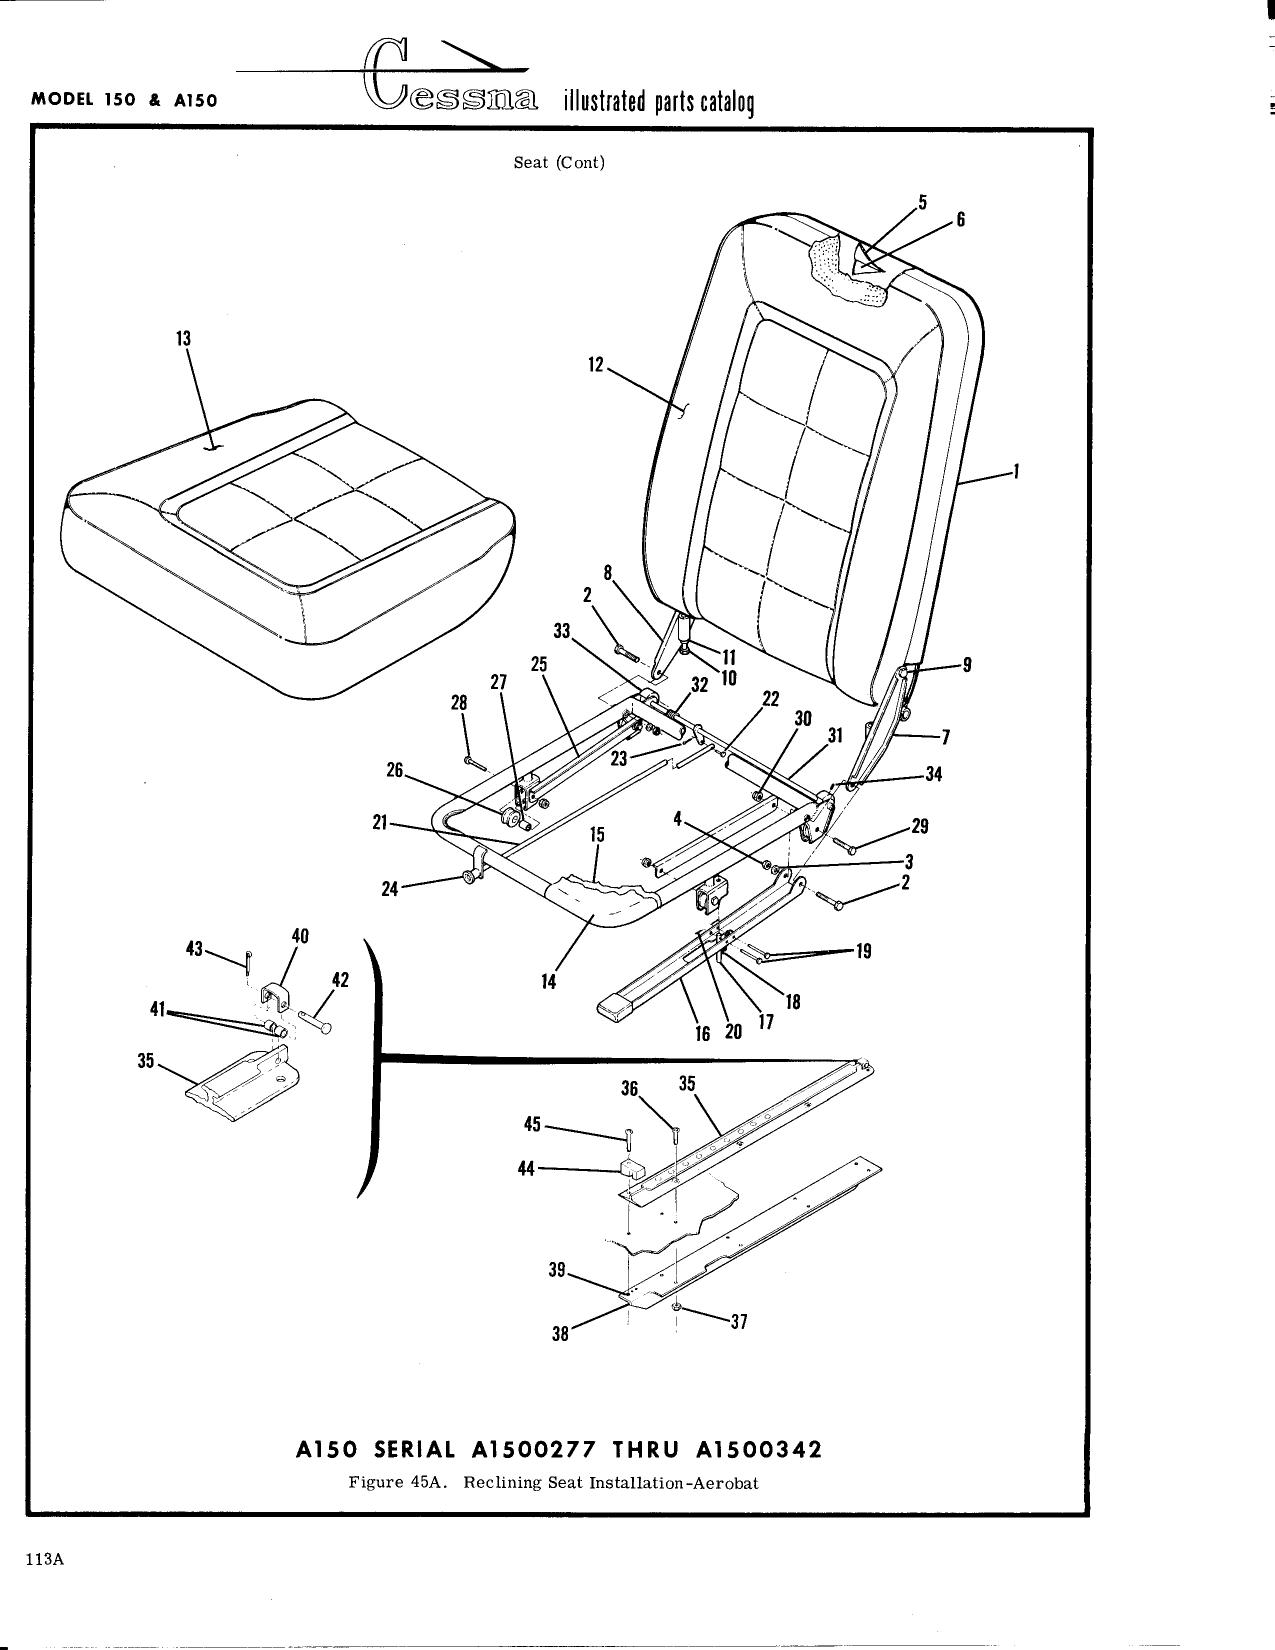 Cessna 172 Seat Parts